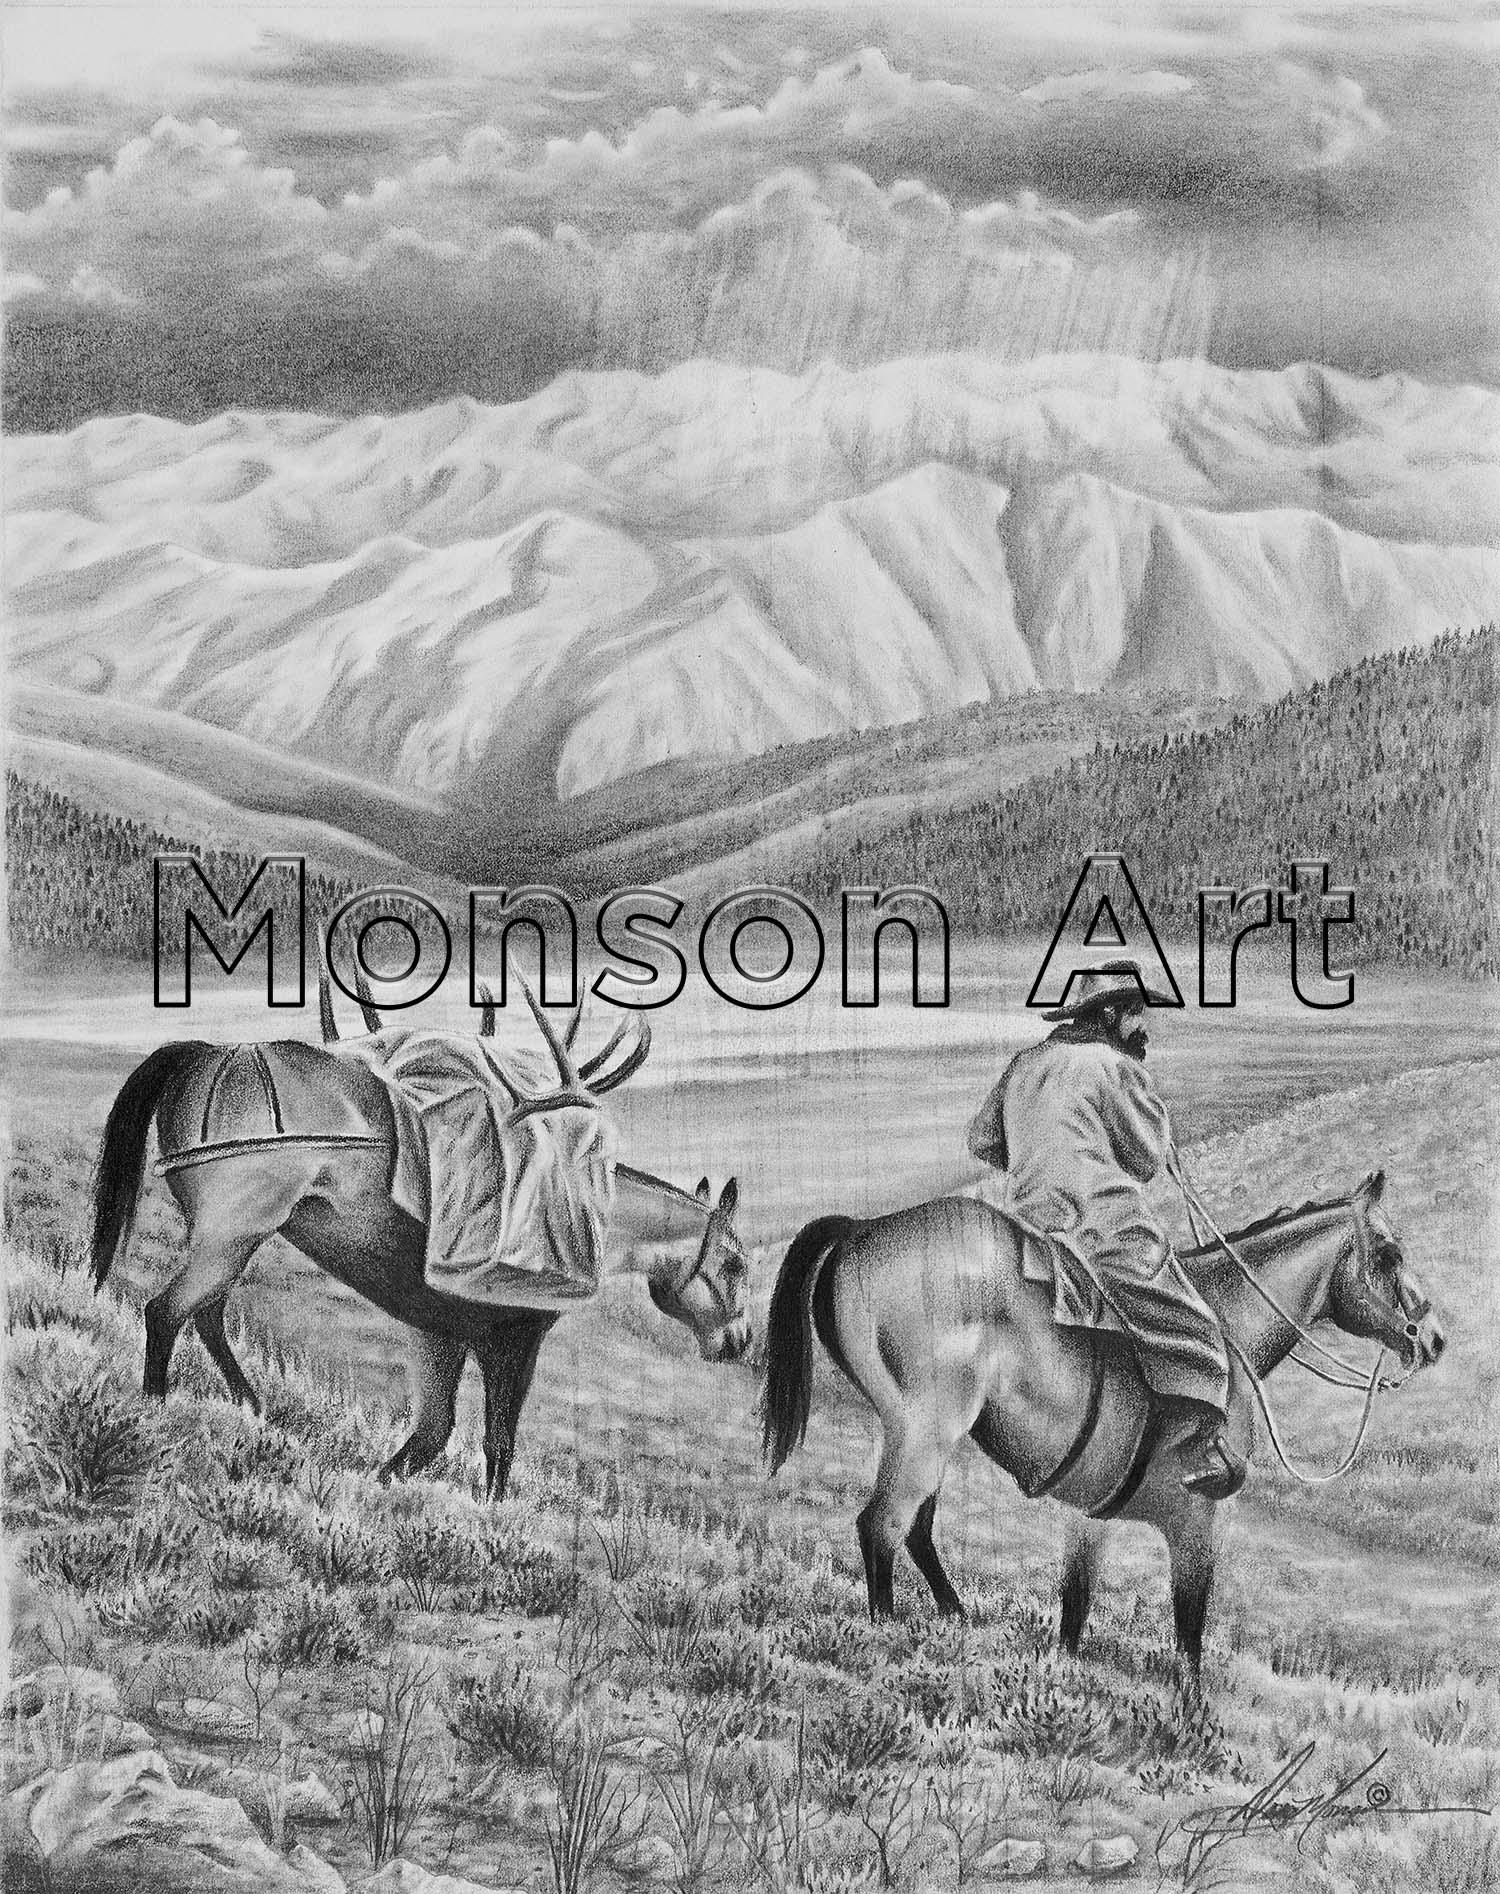 Monson130509-01